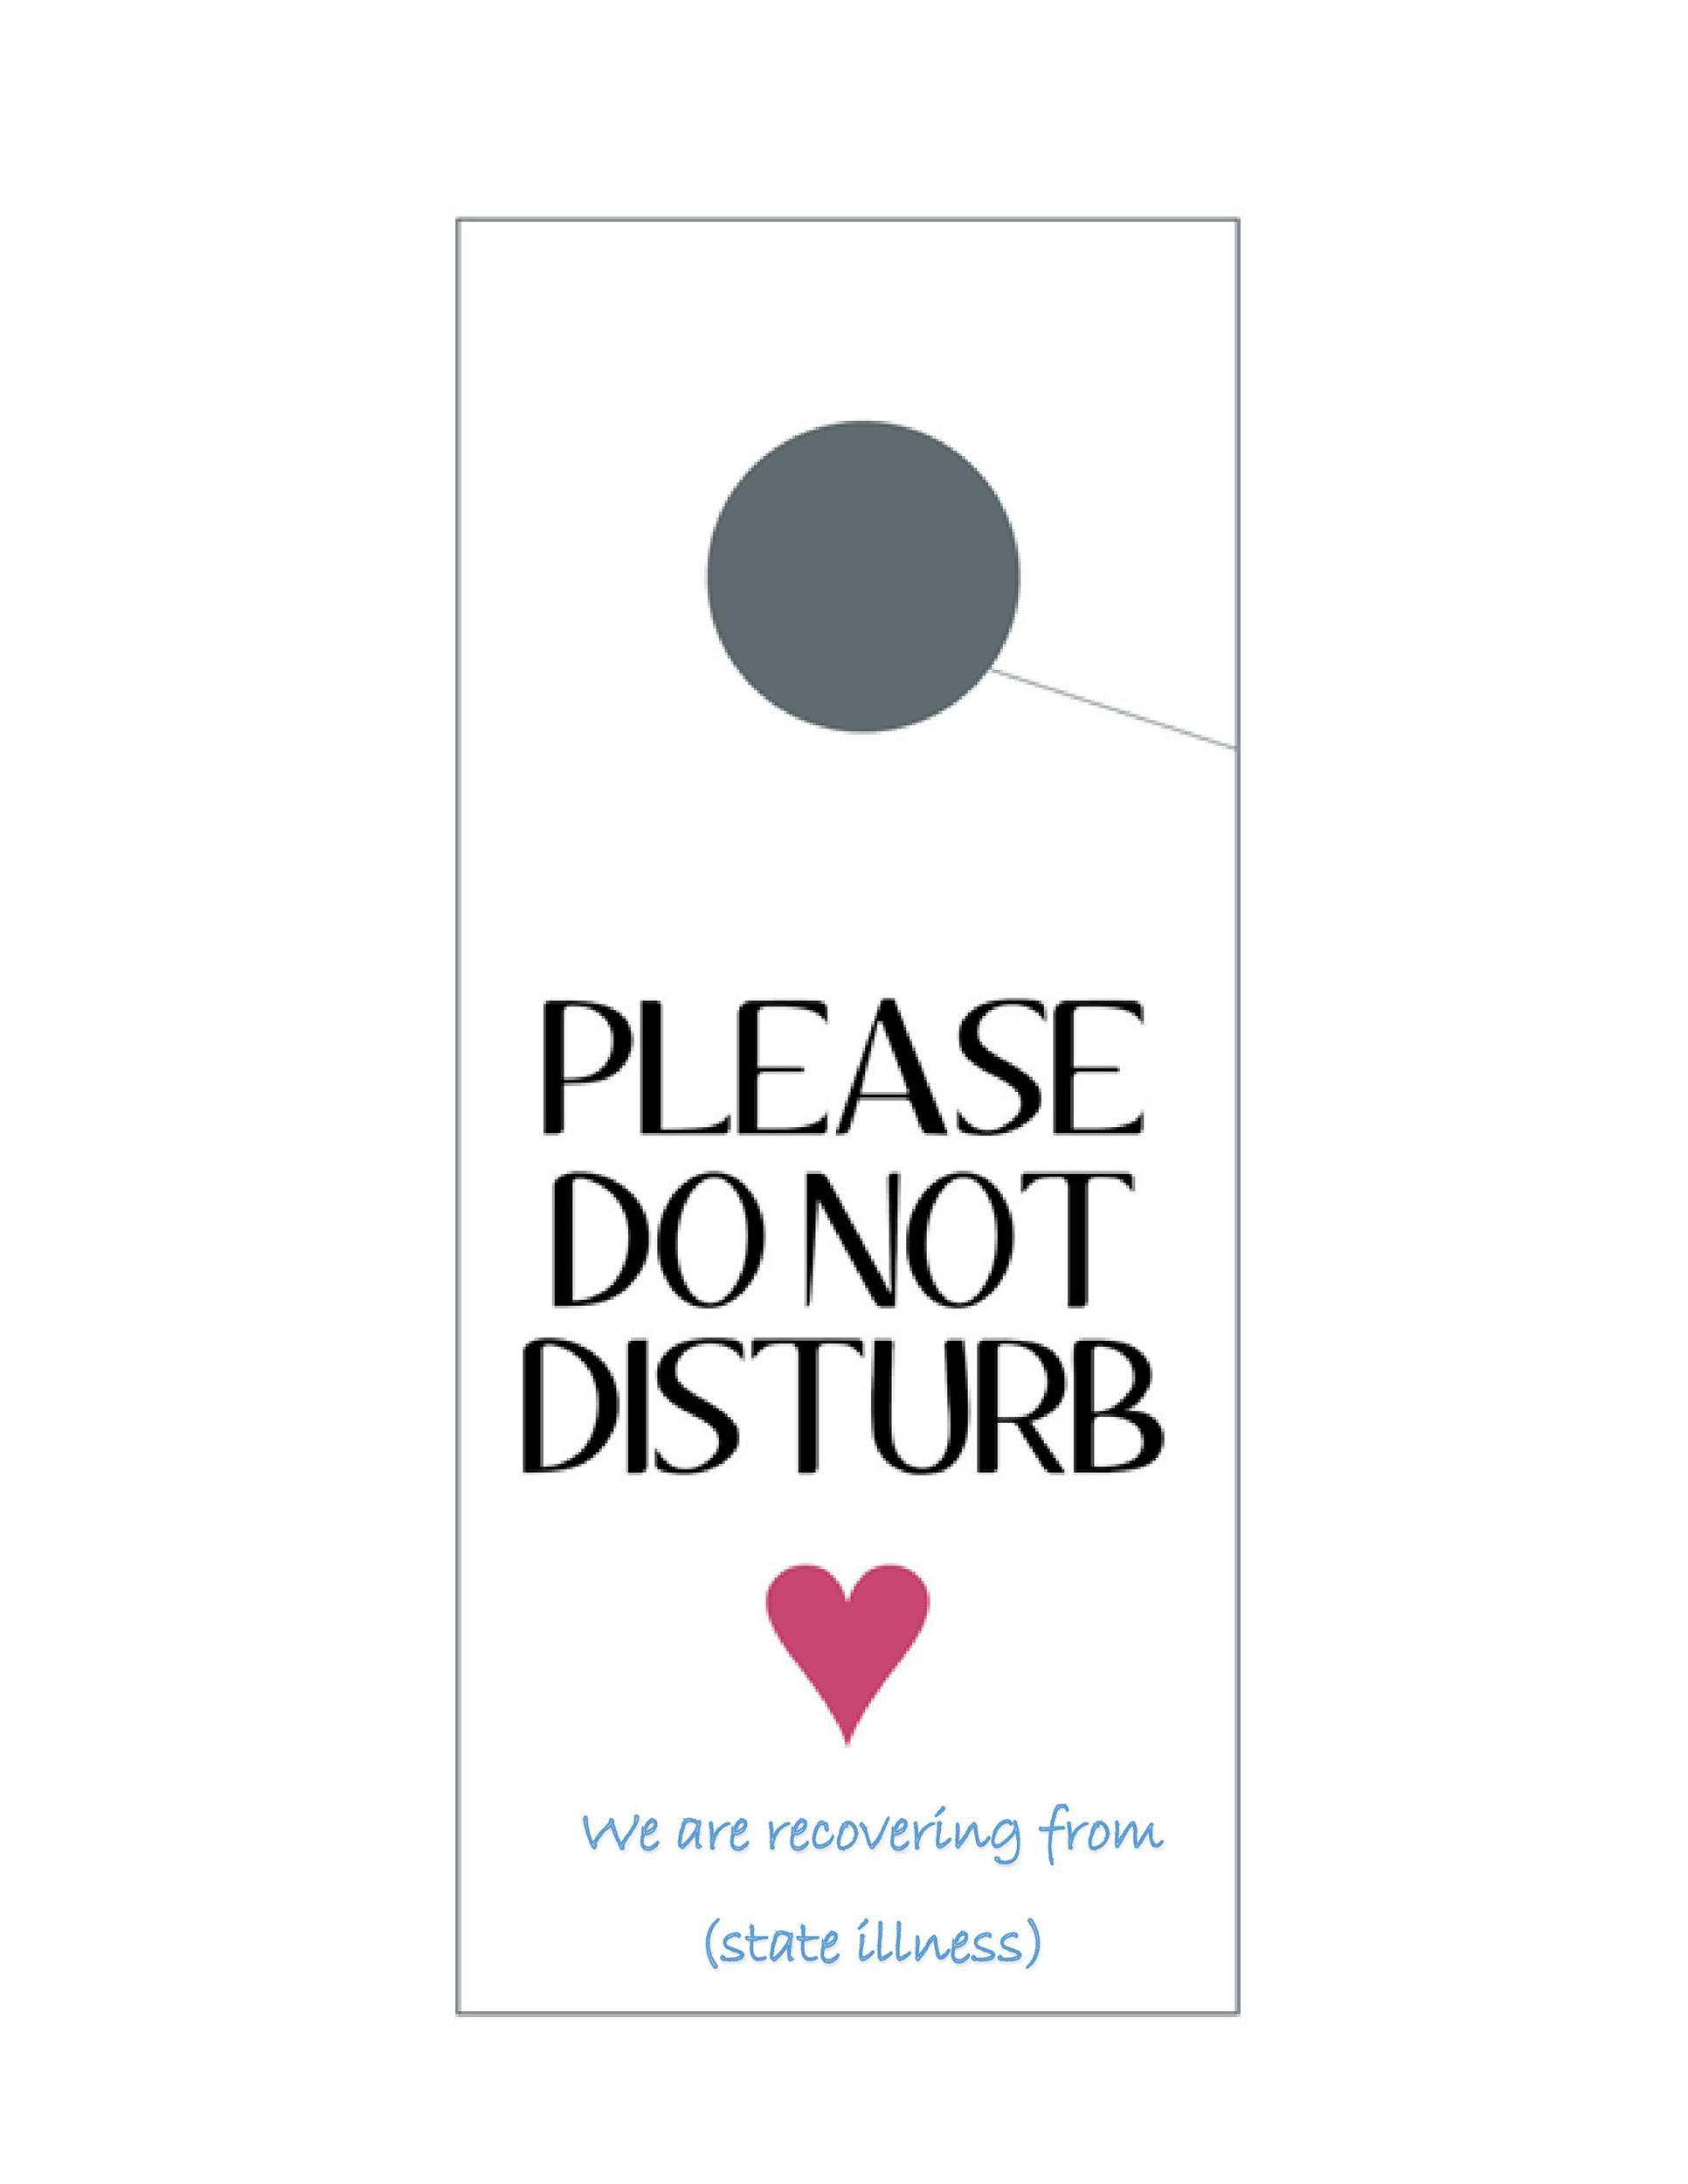 006 Rare Free Template For Door Hanger Word Highest Quality  WeddingFull